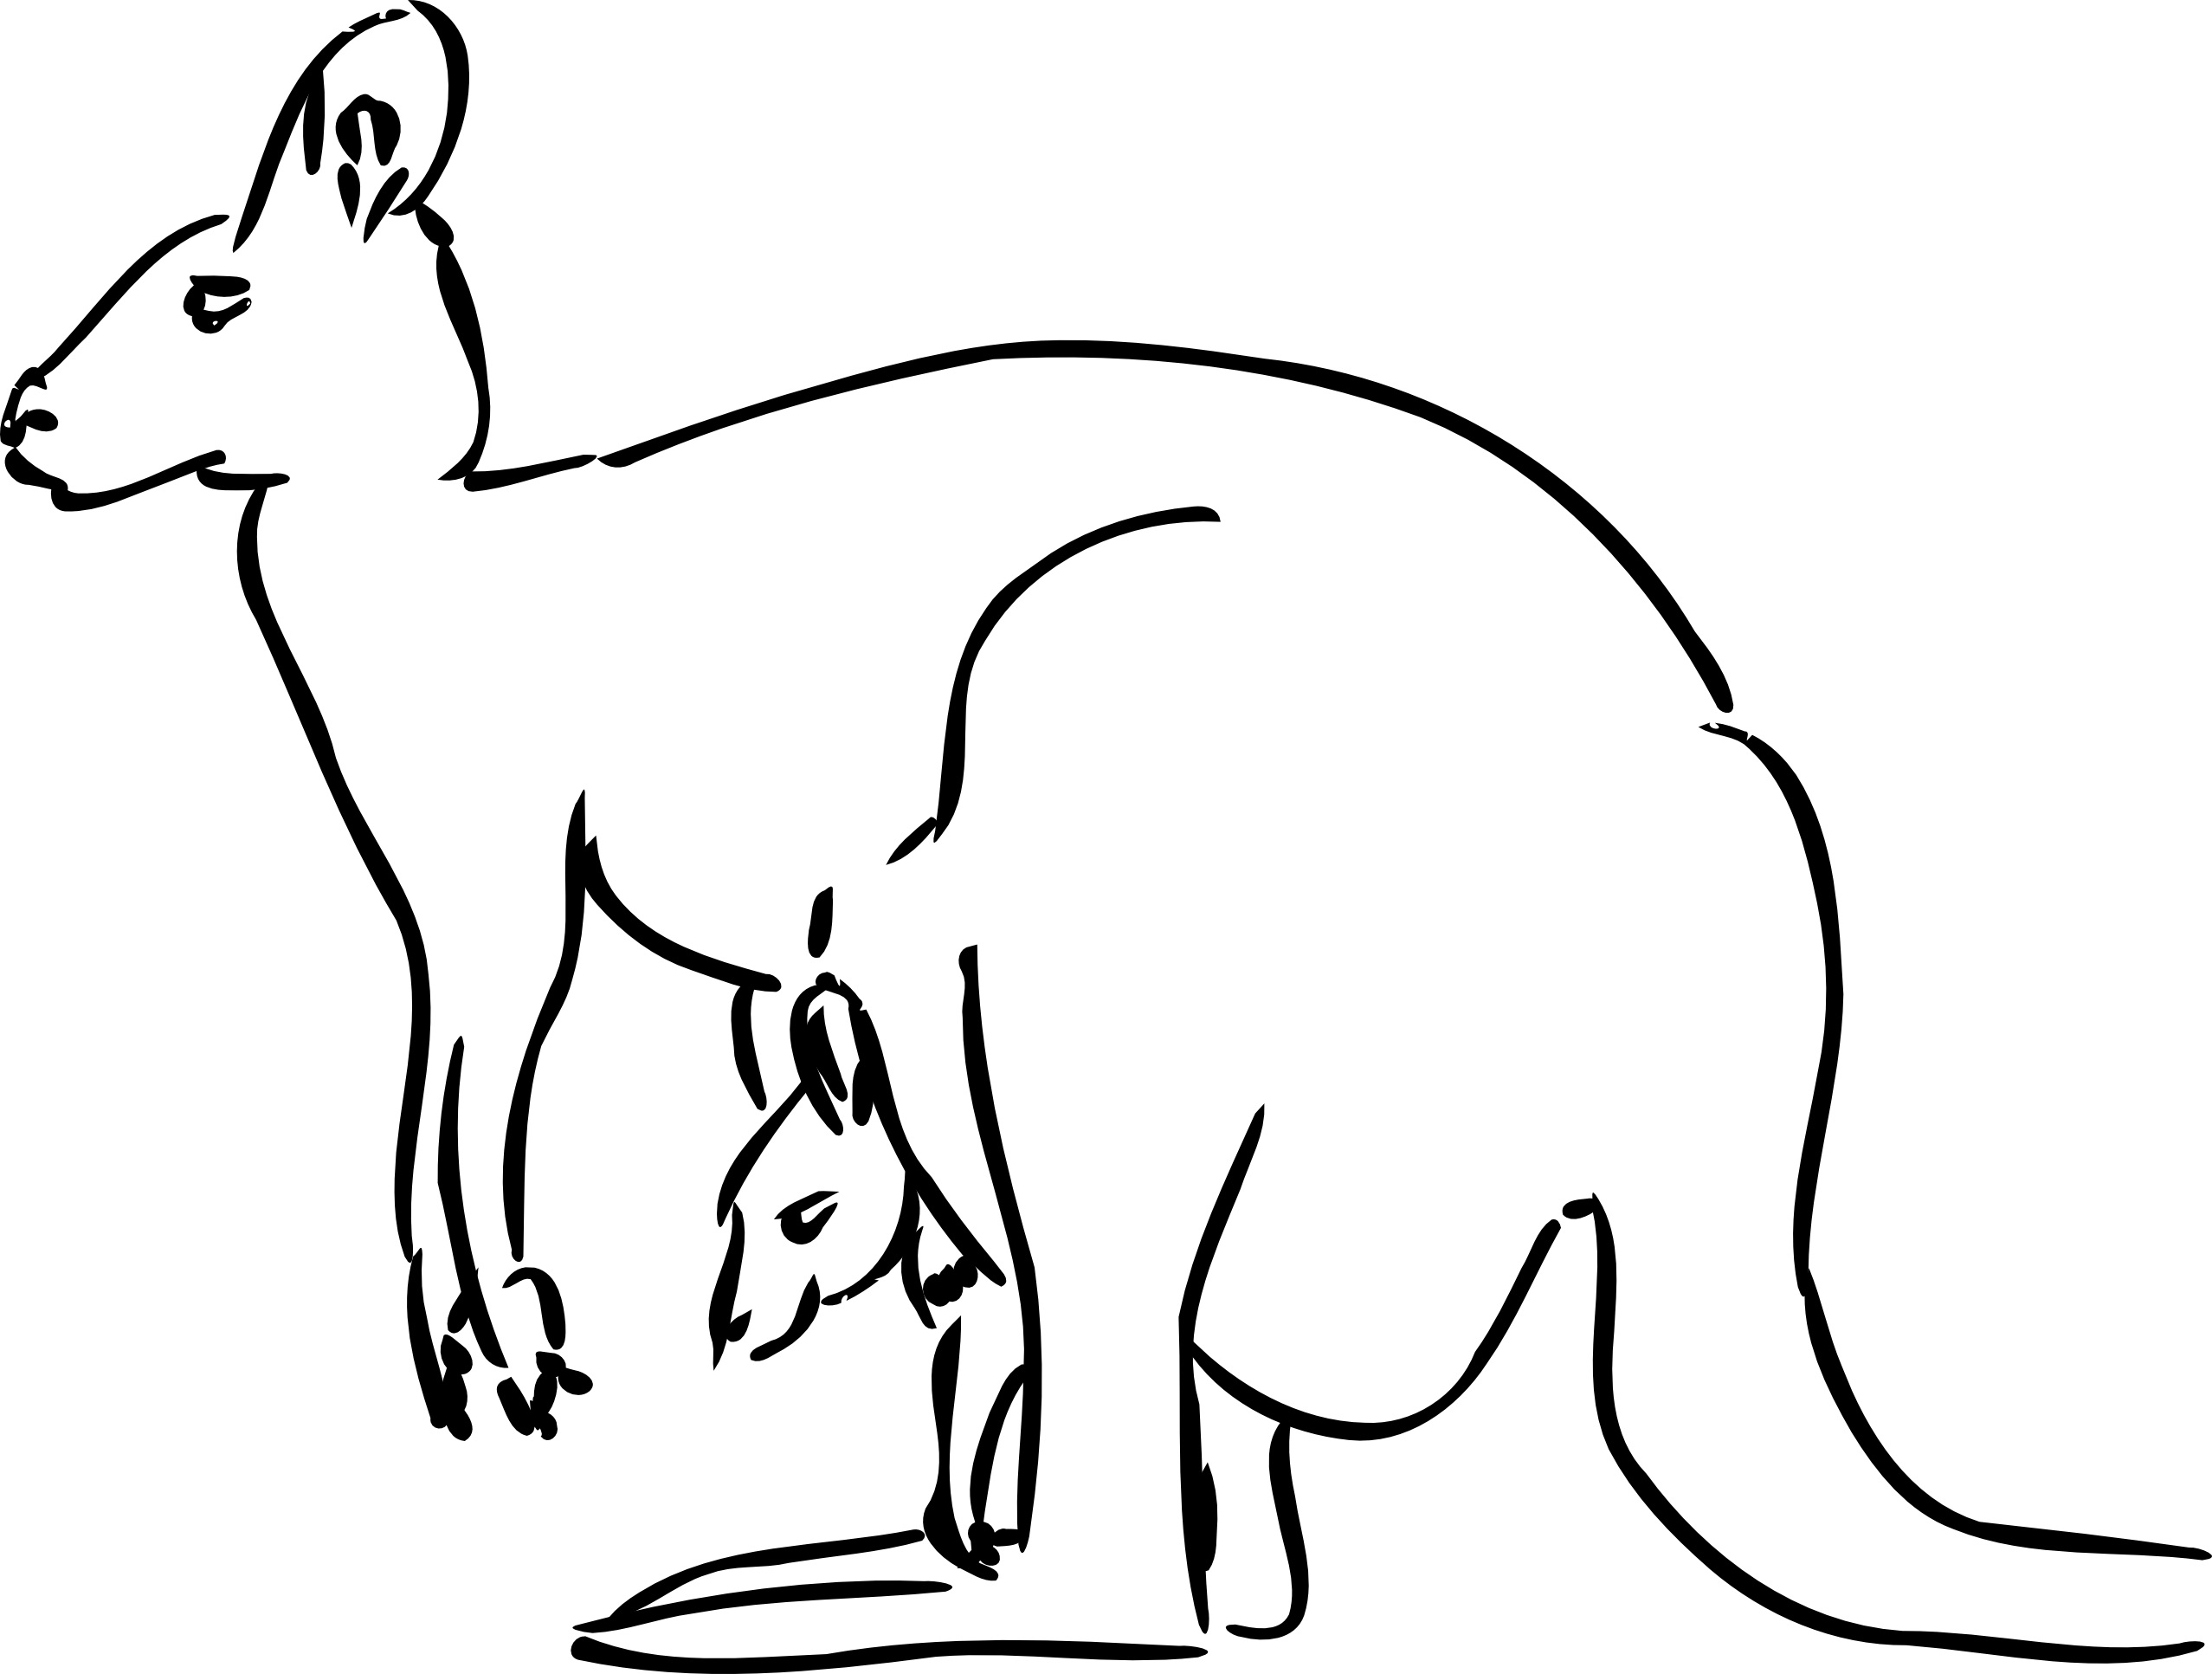 Free Printable Kangaroo Coloring Pages For Kids Animal Place